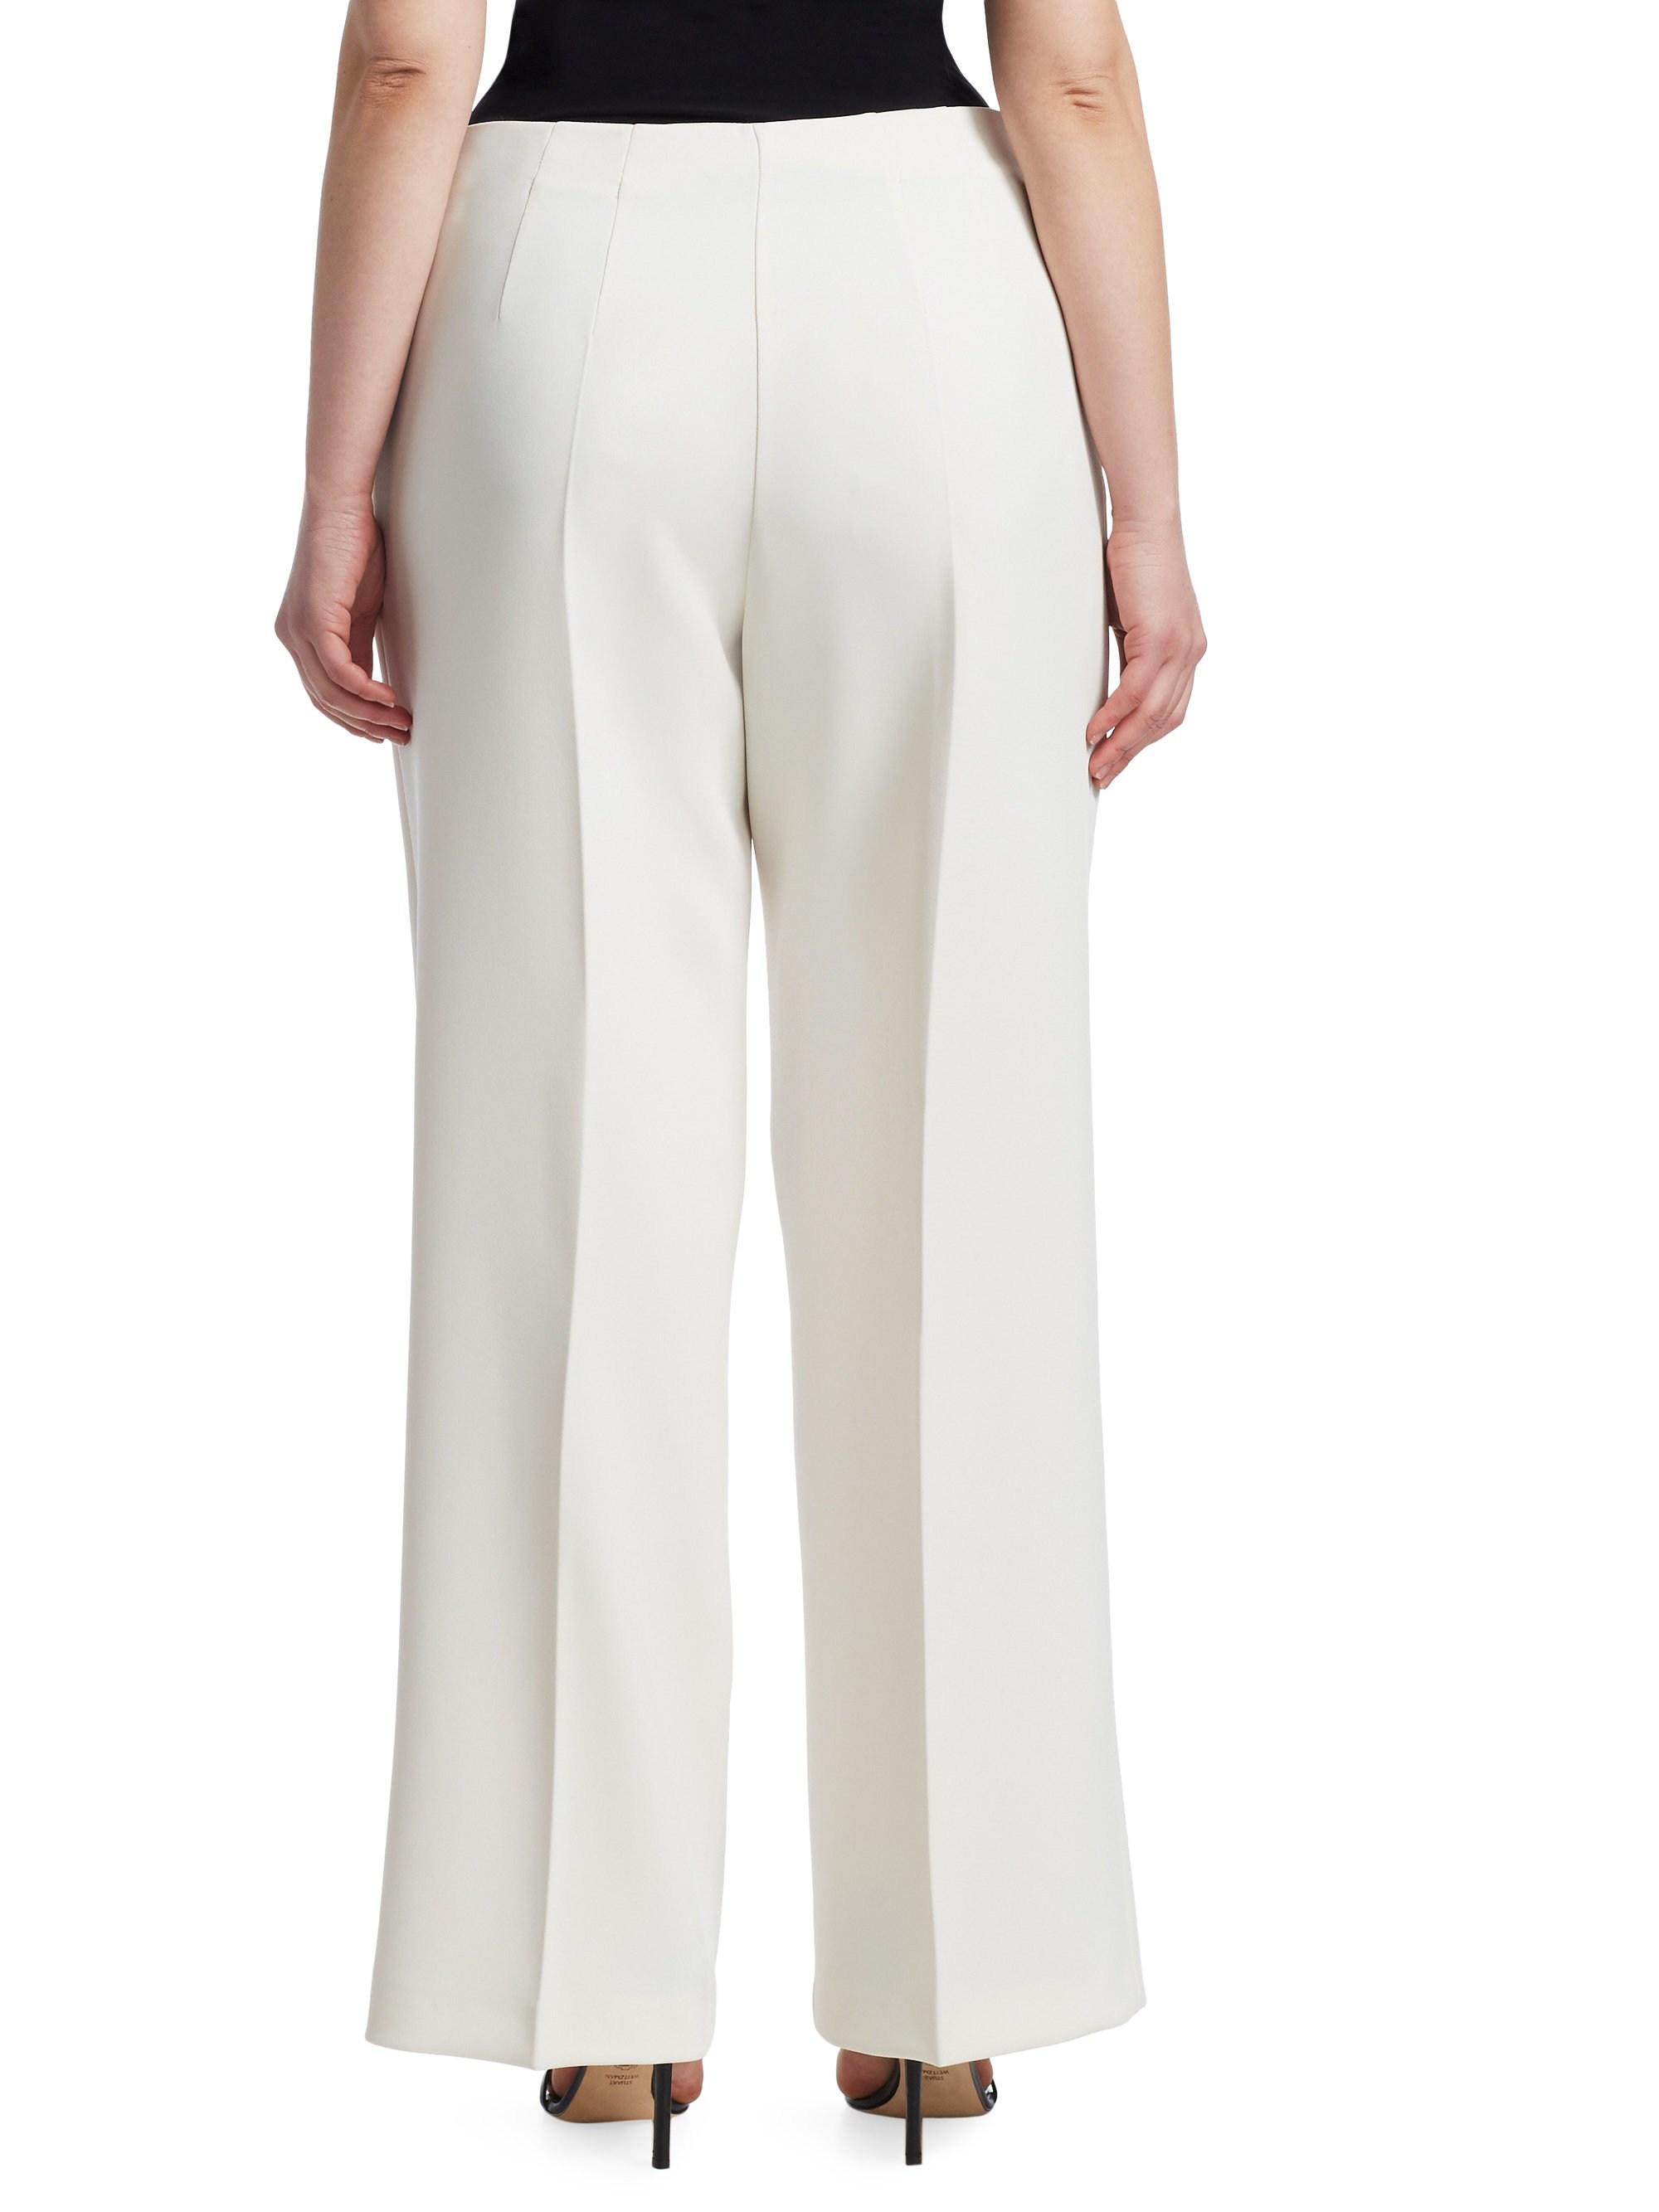 4f48d058488 Lyst - Marina Rinaldi Radice Wide-leg Trousers in White